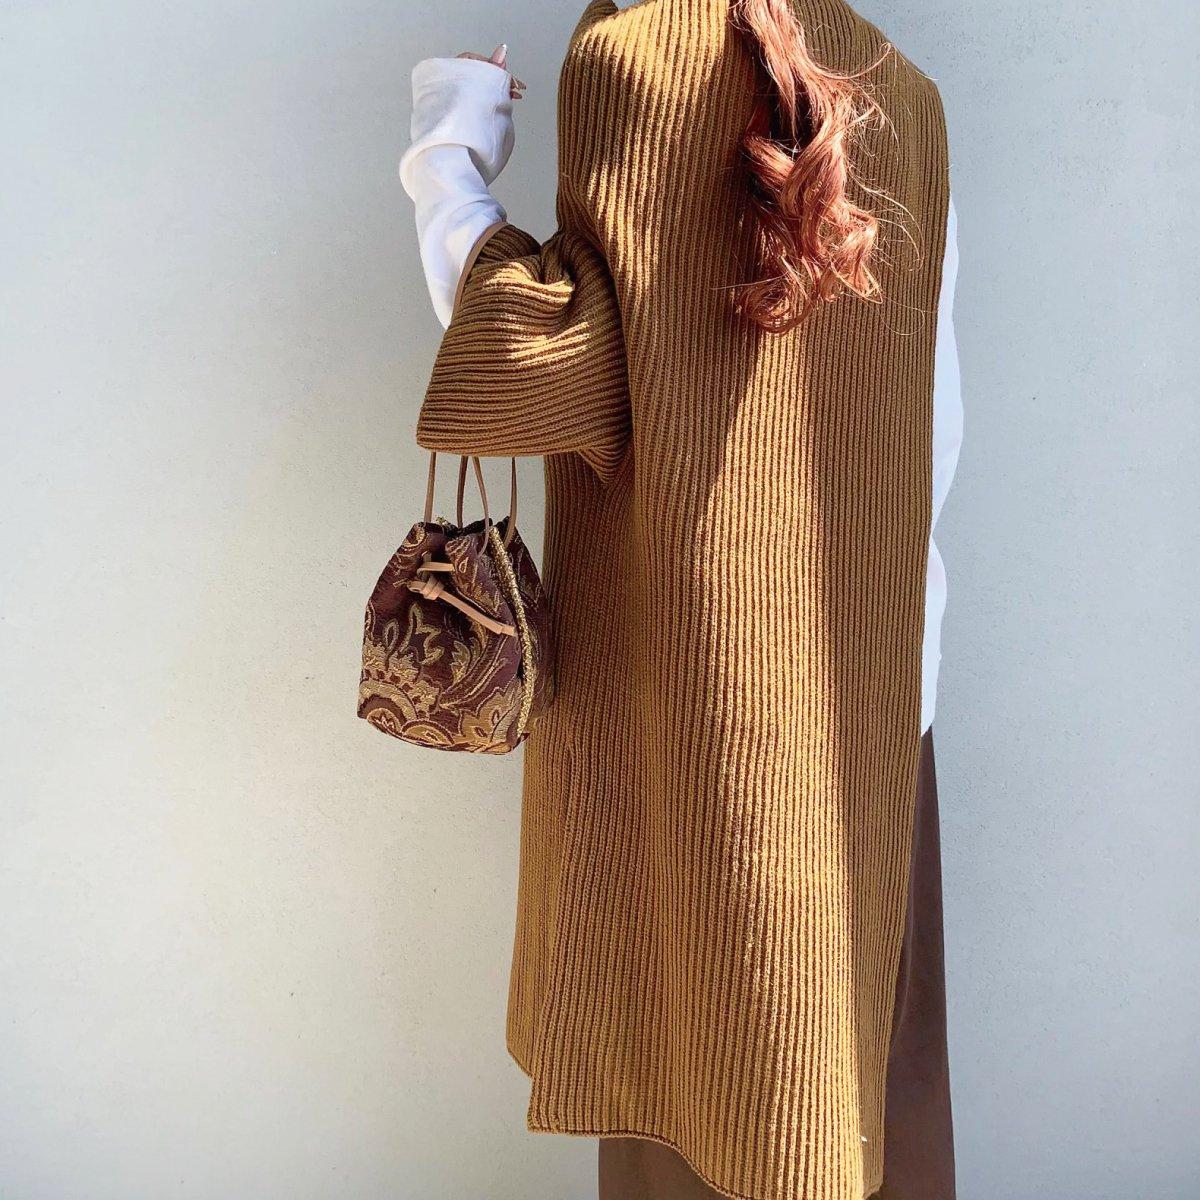 Antique Gobelin Bag 詳細画像6